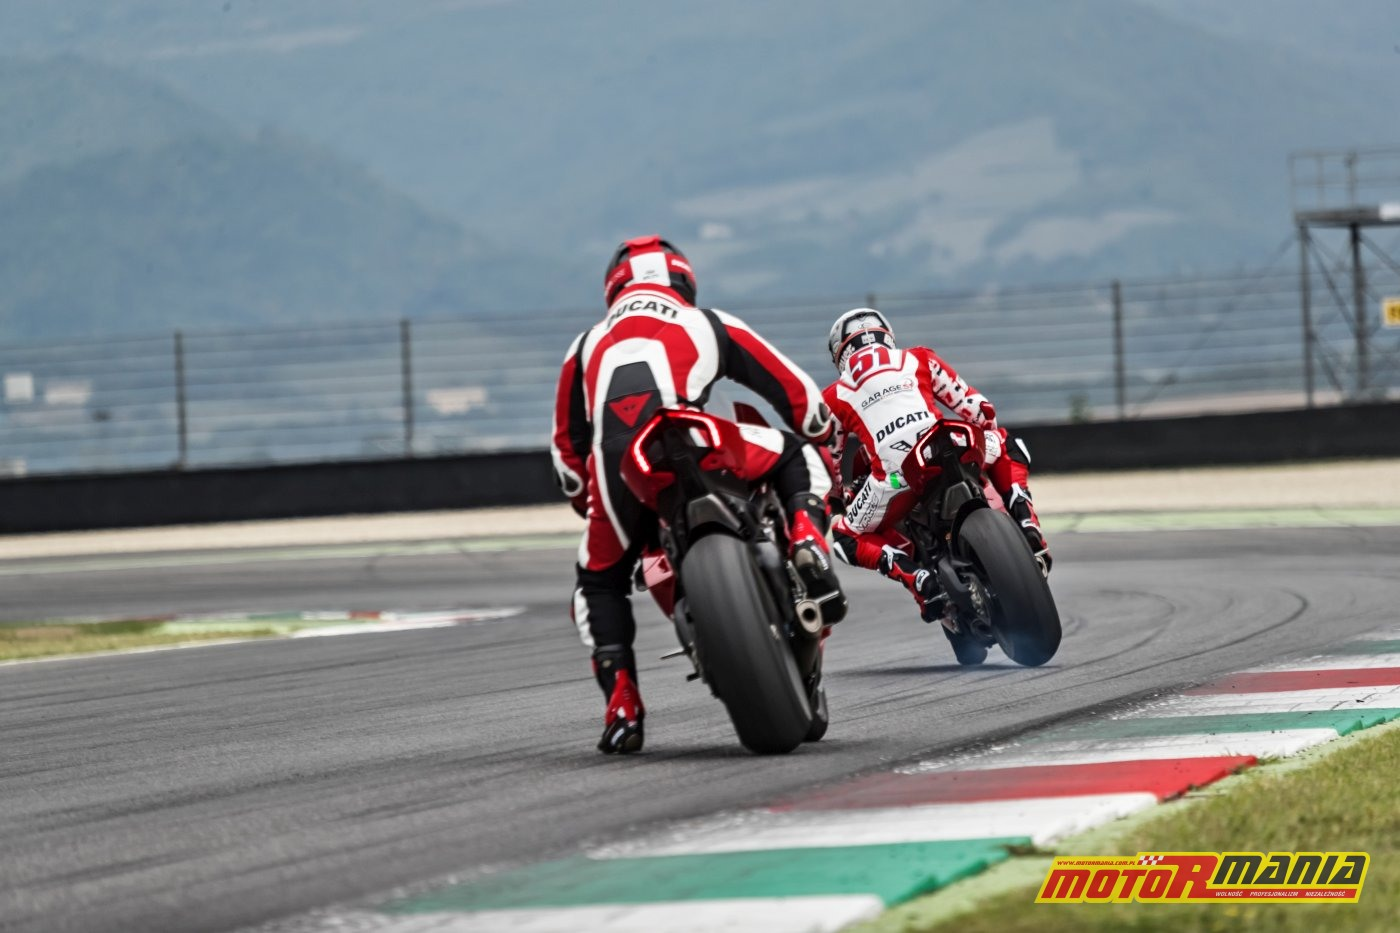 Ducati Panigale V4 R 2019 (53)